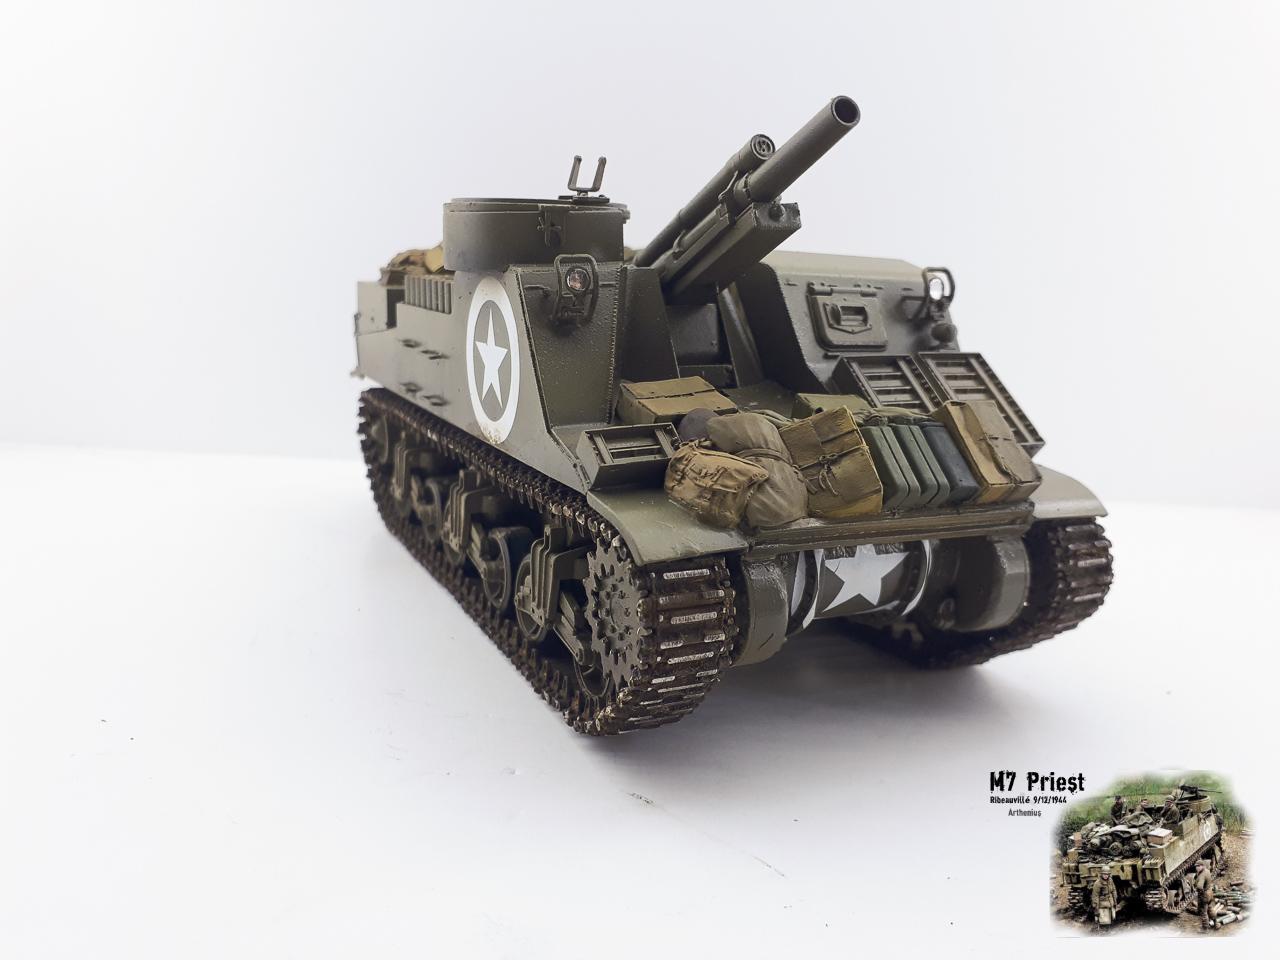 M7 Priest Ribeauvillé 9/12/1944 - Page 2 2018-104